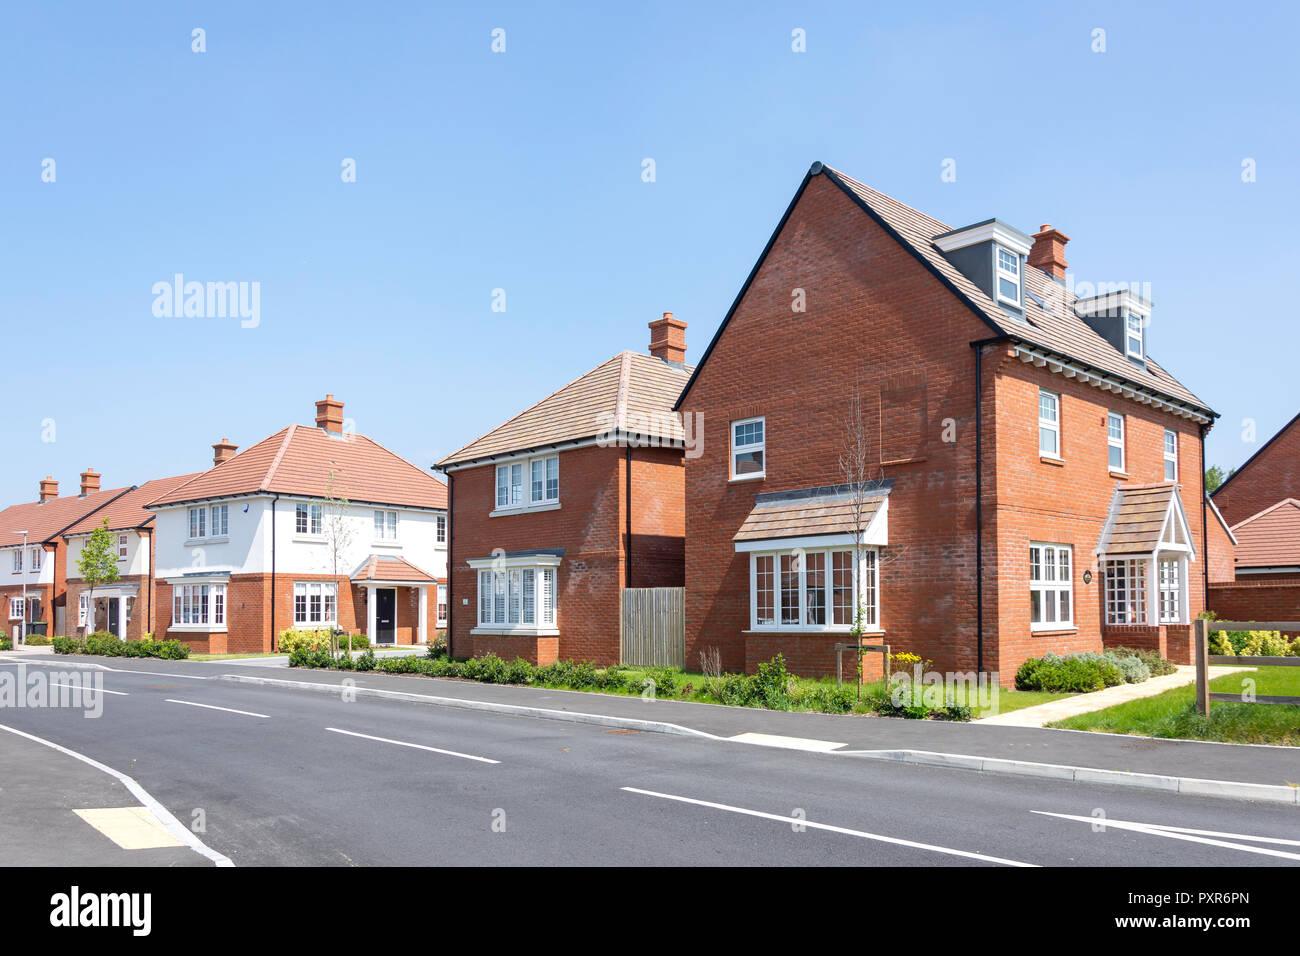 Westgate housing development, Baggs Lane, Wareham, Dorset, England, United Kingdom - Stock Image